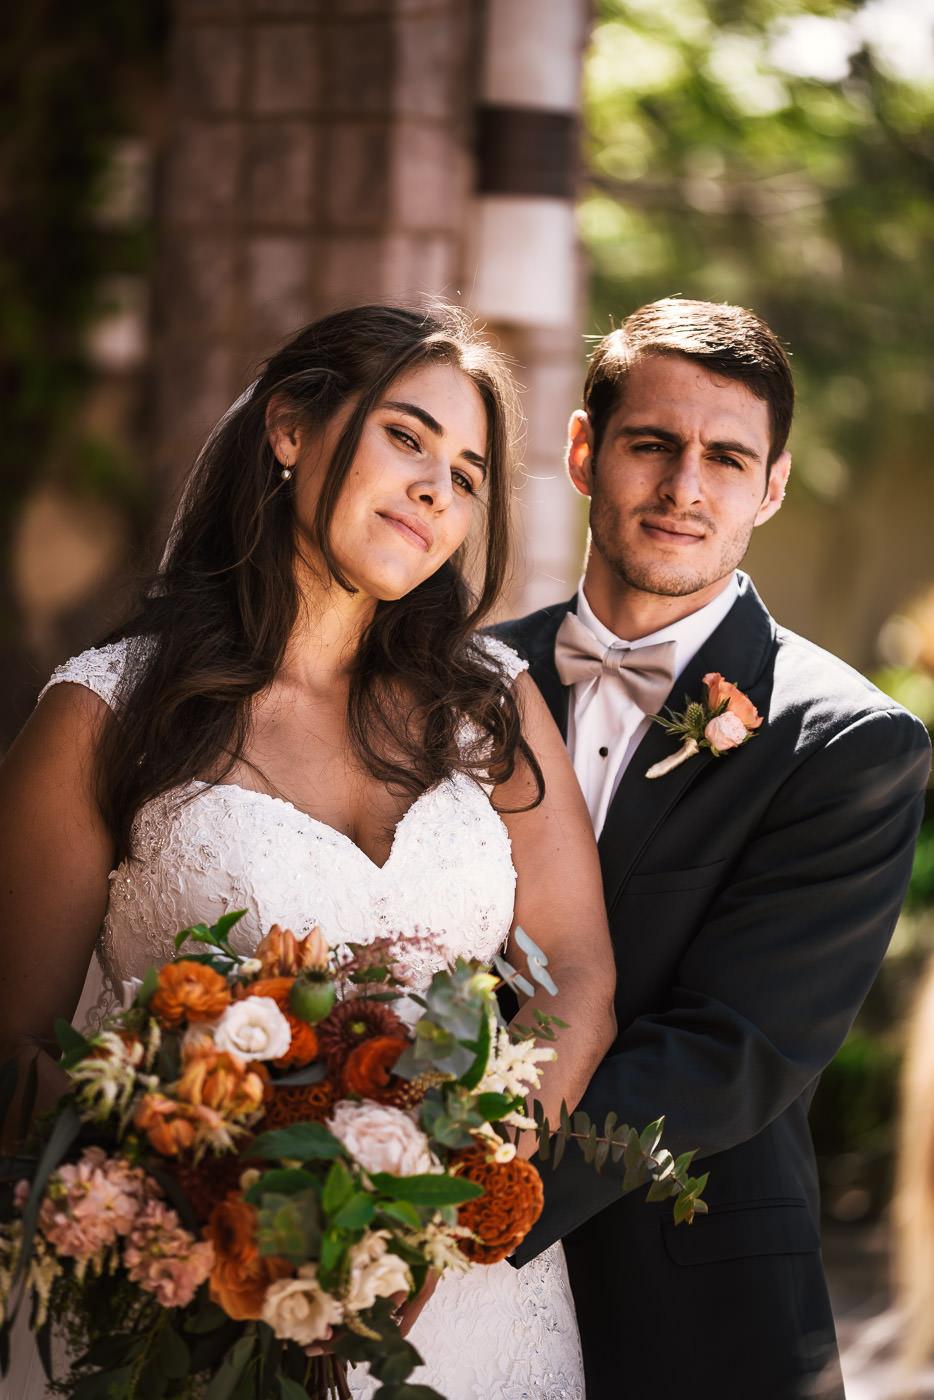 Stunning bride and groom pose to create beautiful wedding photos.